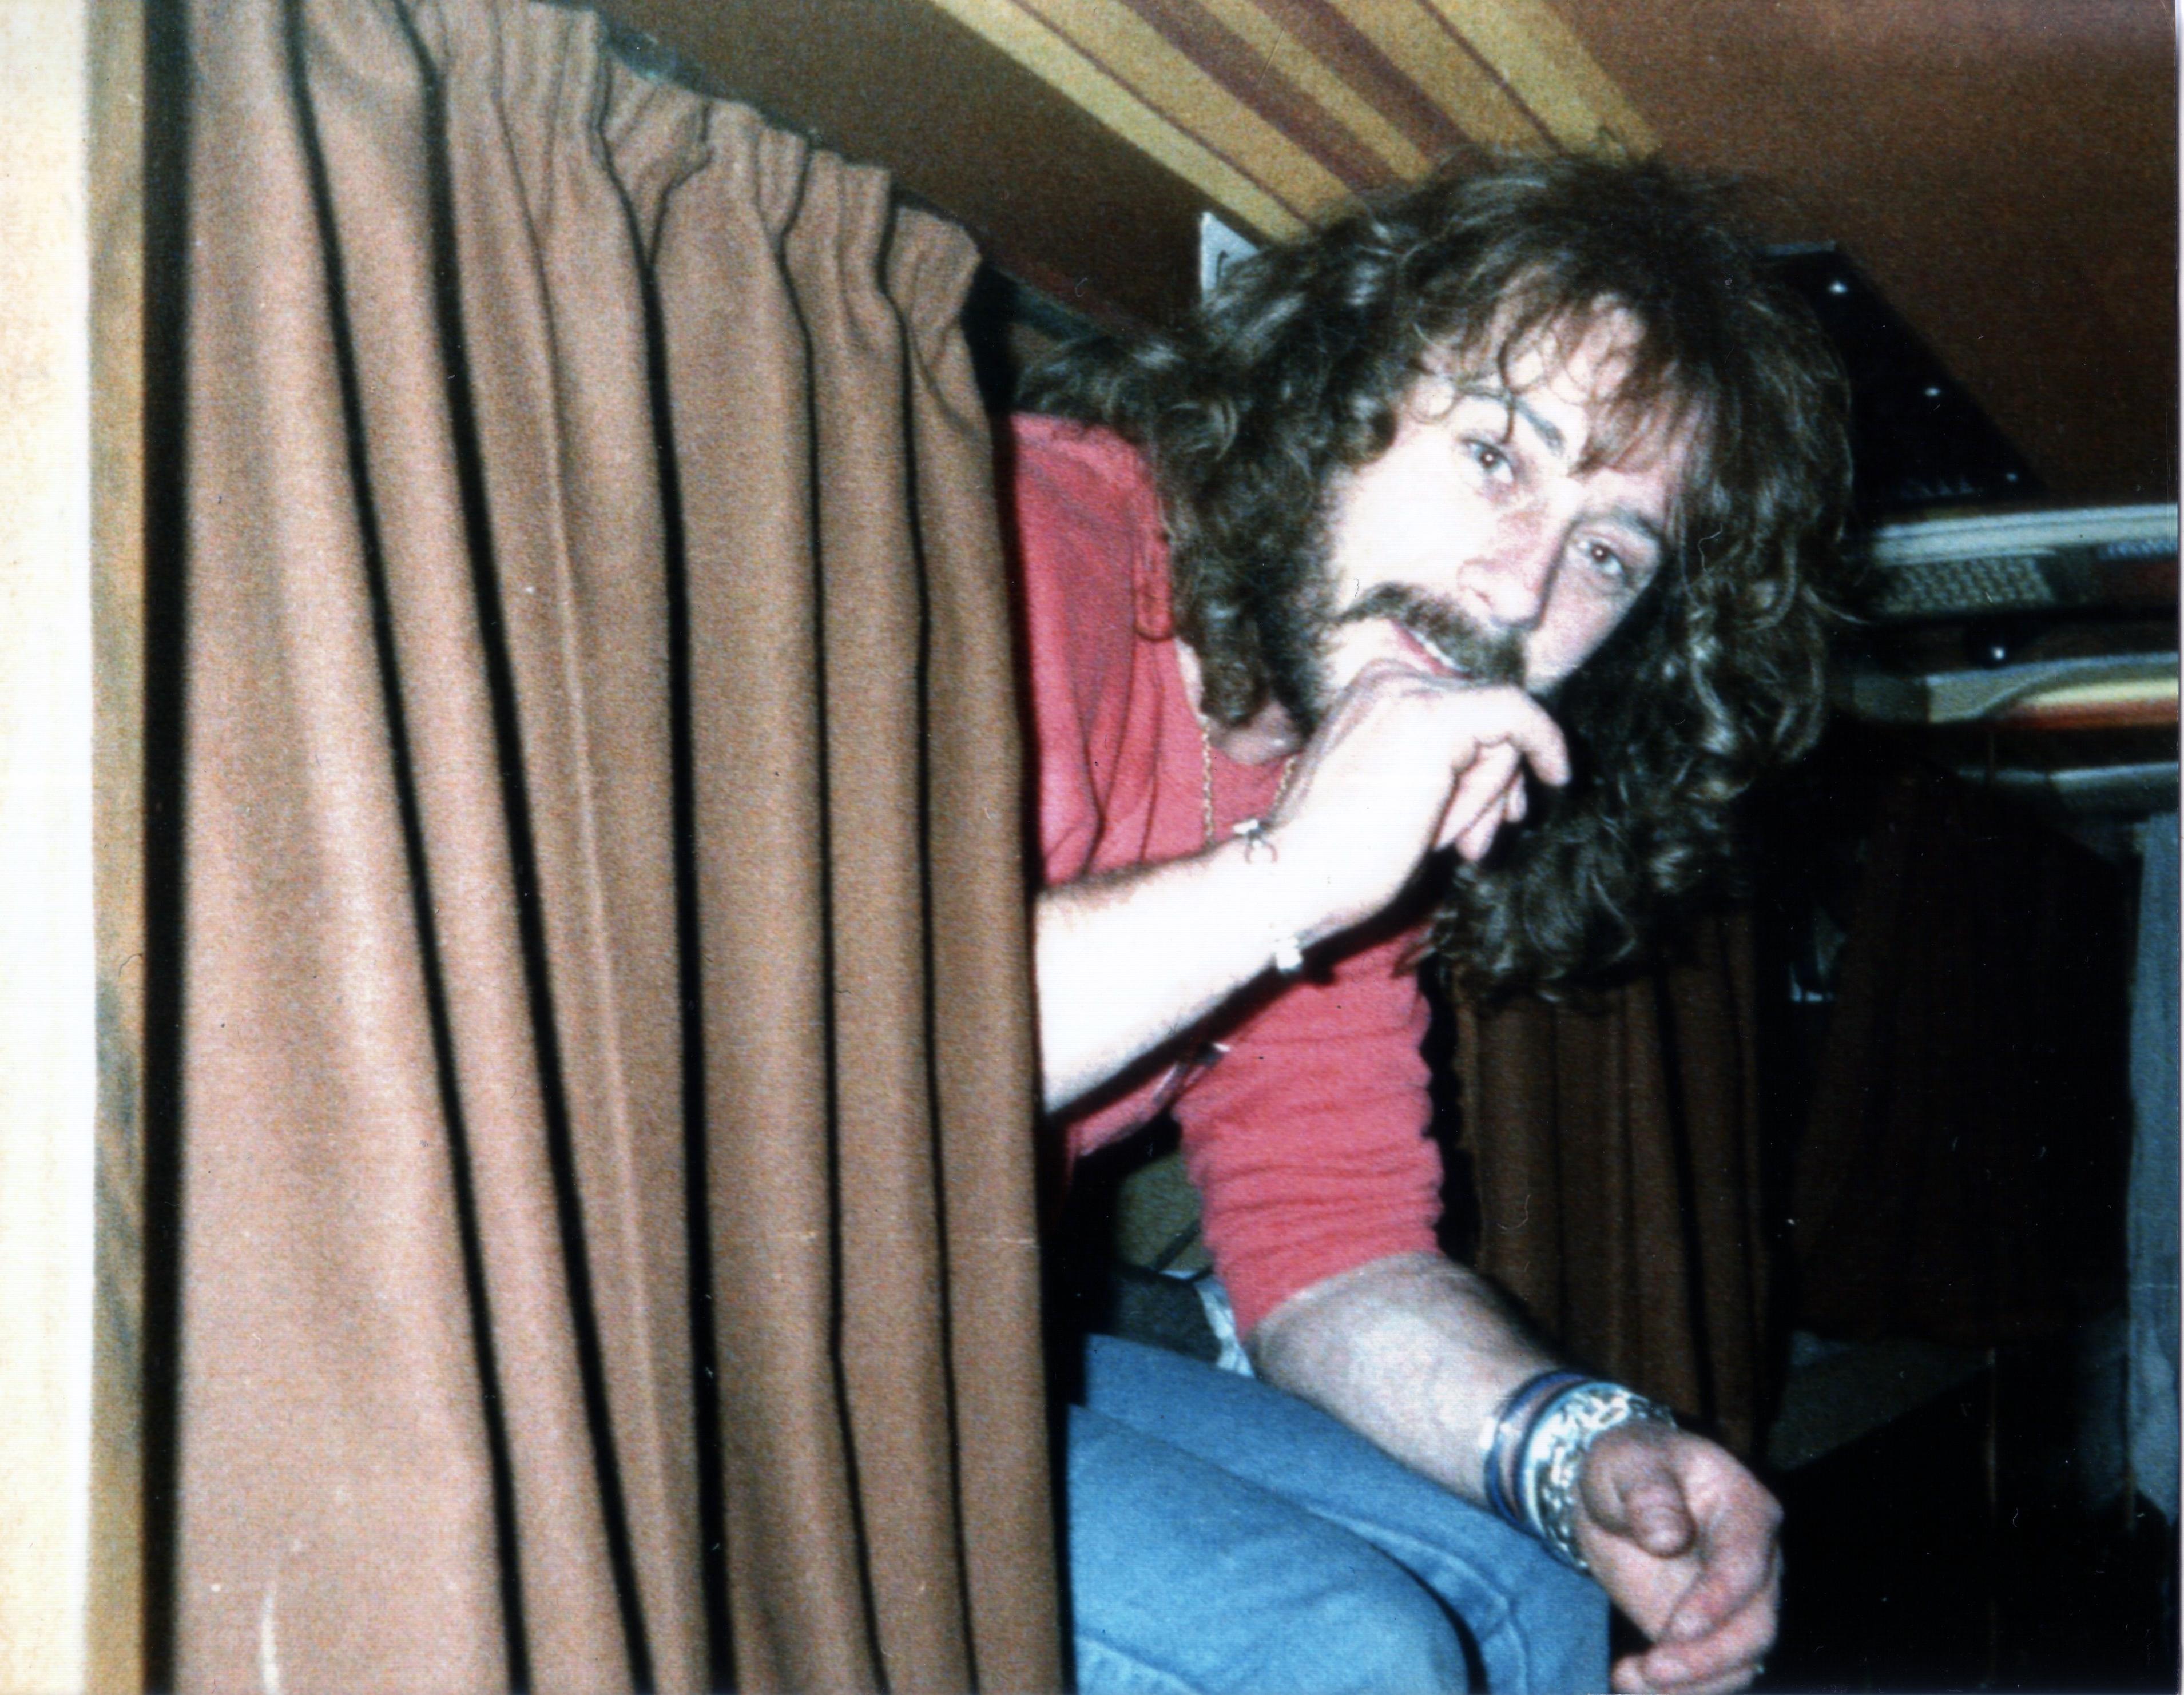 Chas (AKA gasious) tour bus '86